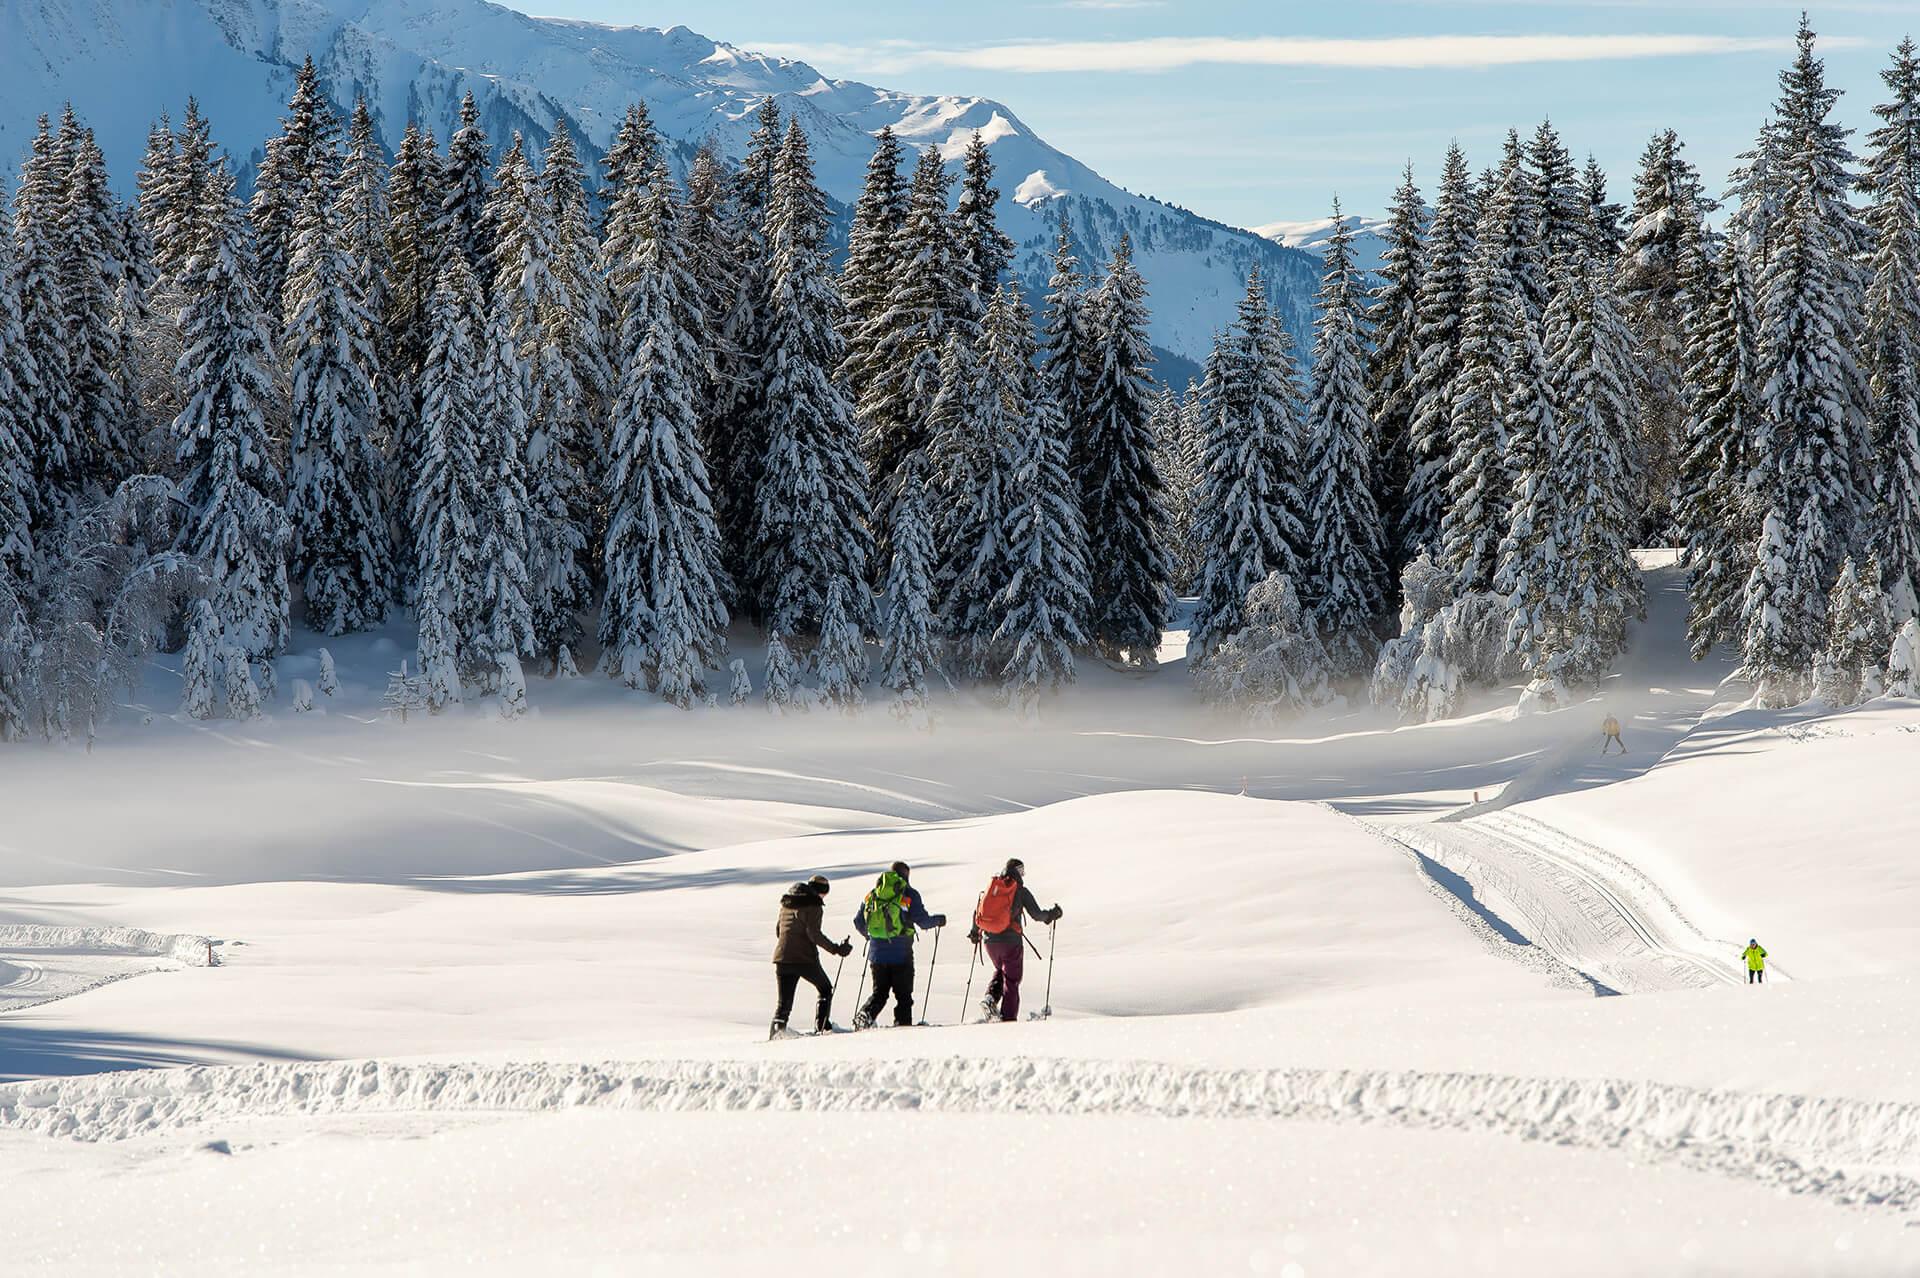 263_190116_Winterweitwandern